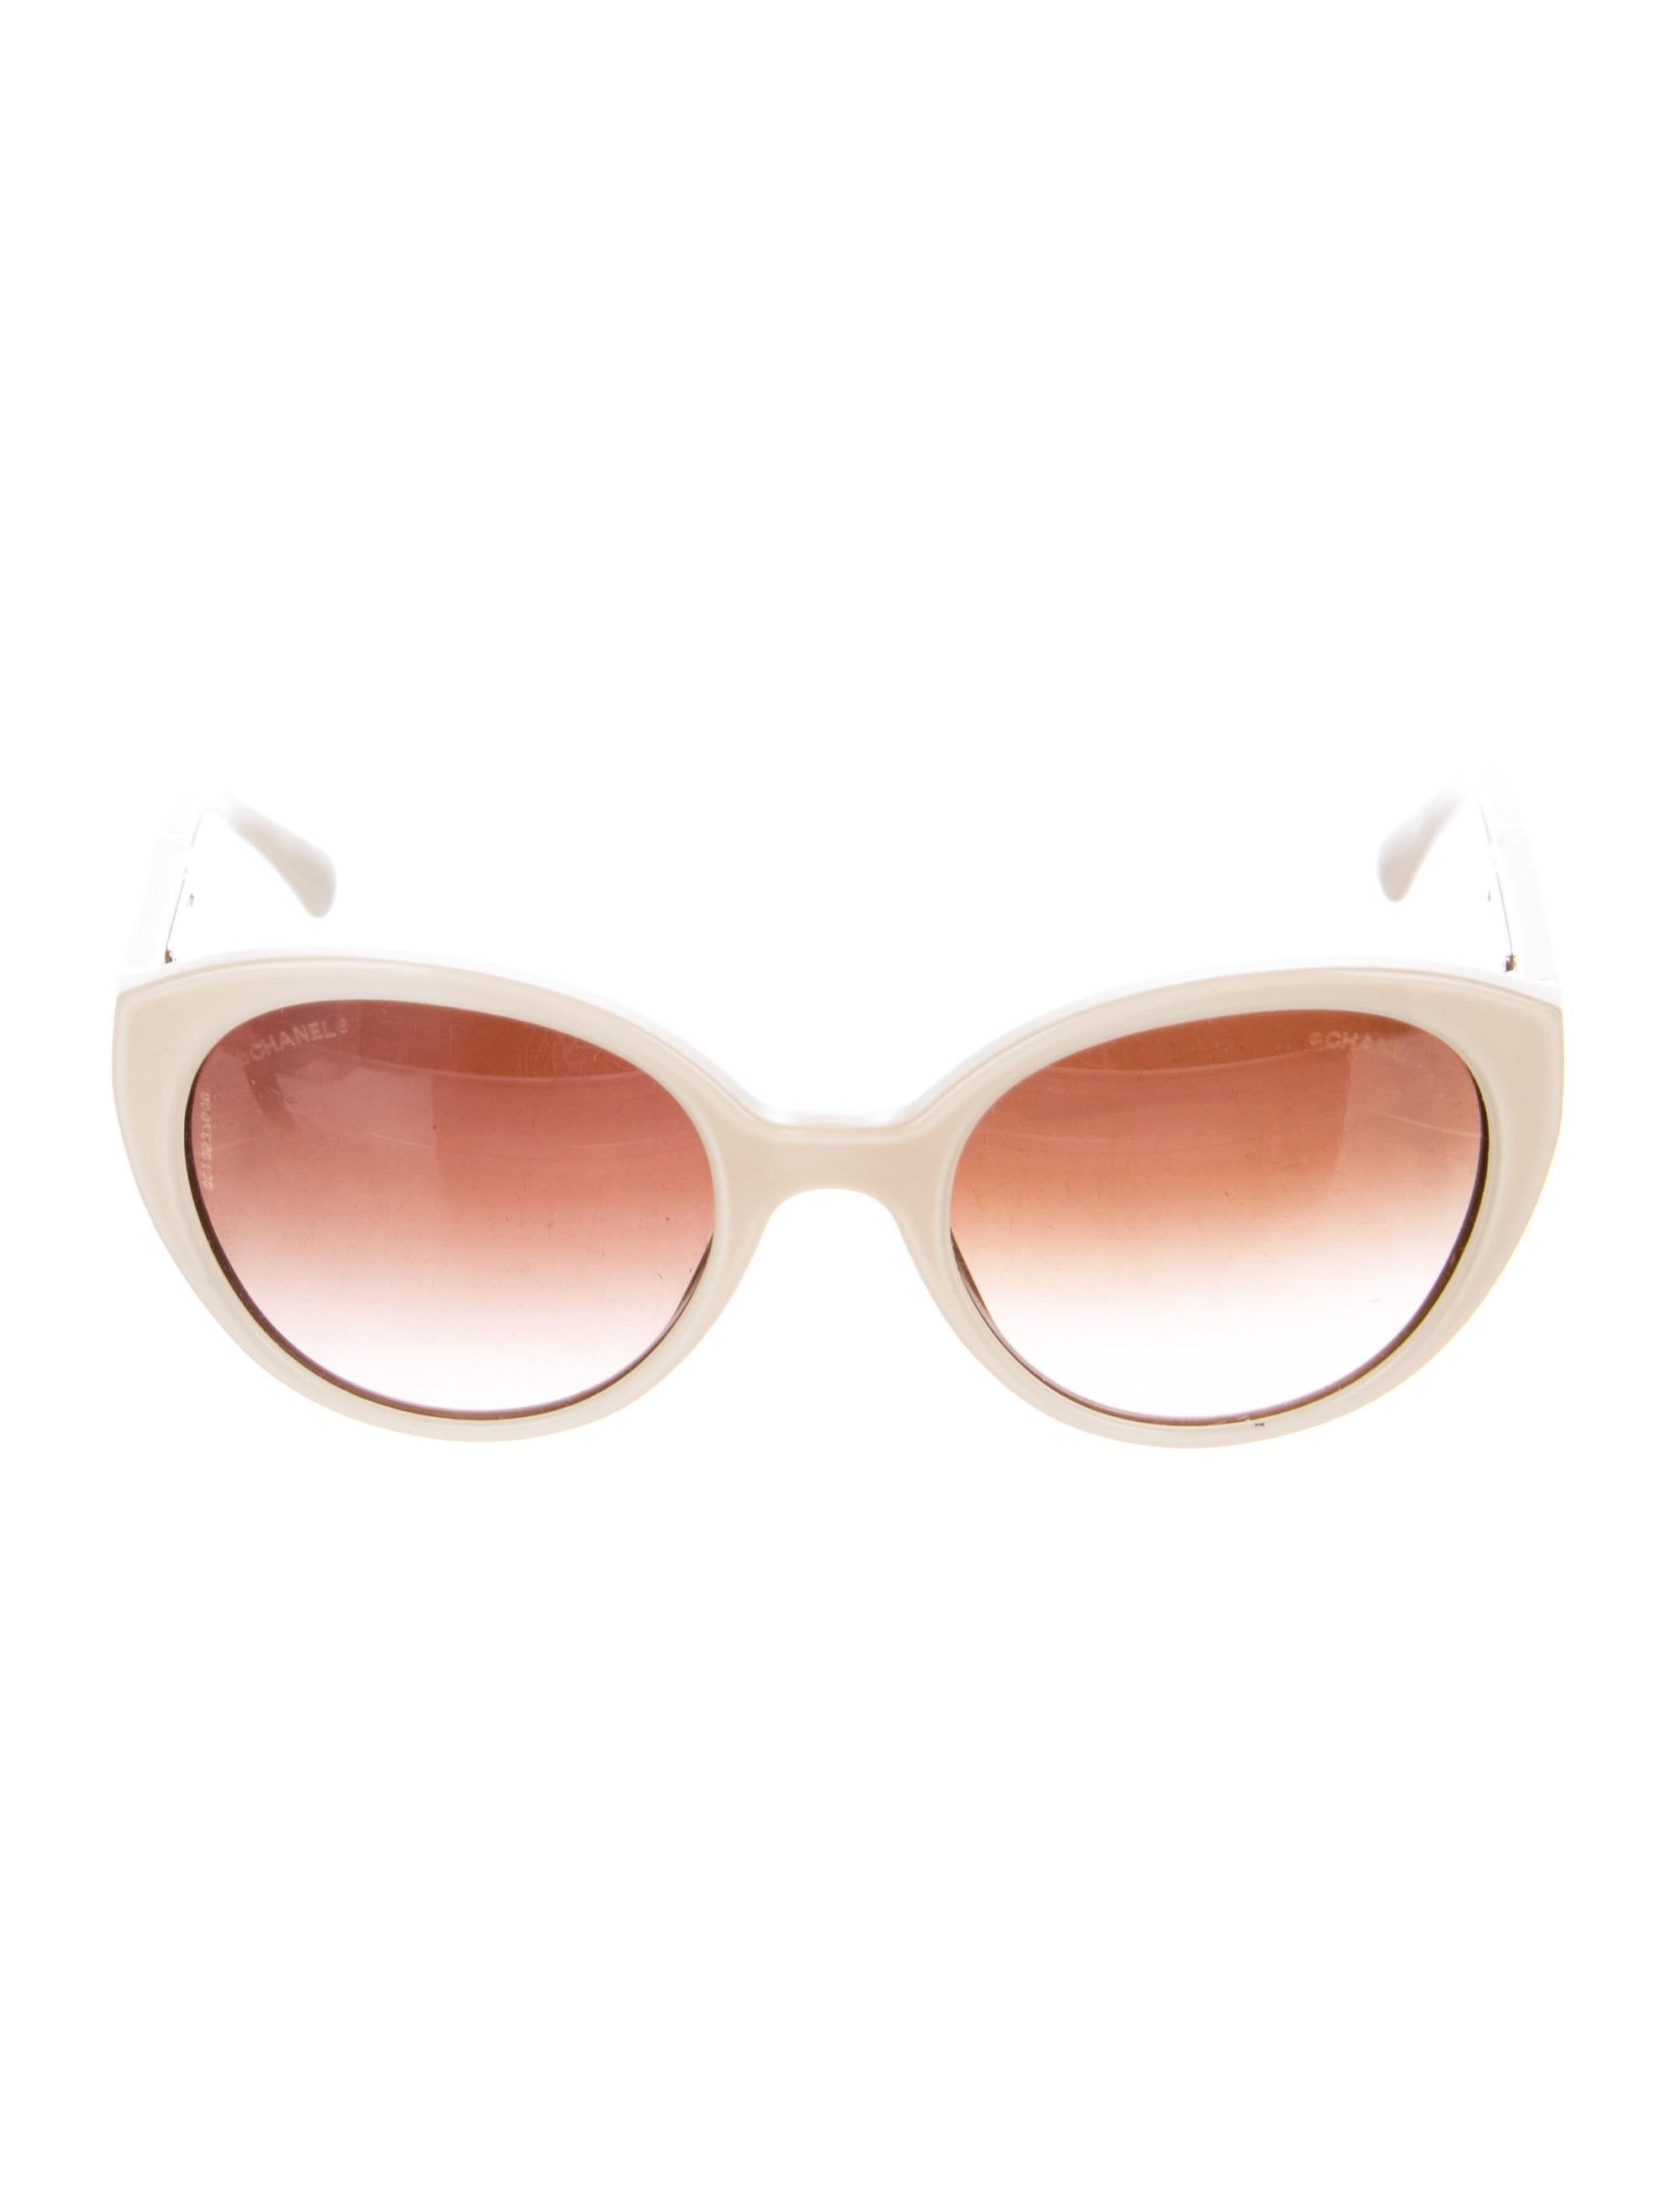 c4bdf413277fc Chanel CC Cat-Eye Sunglasses - Accessories - CHA235684